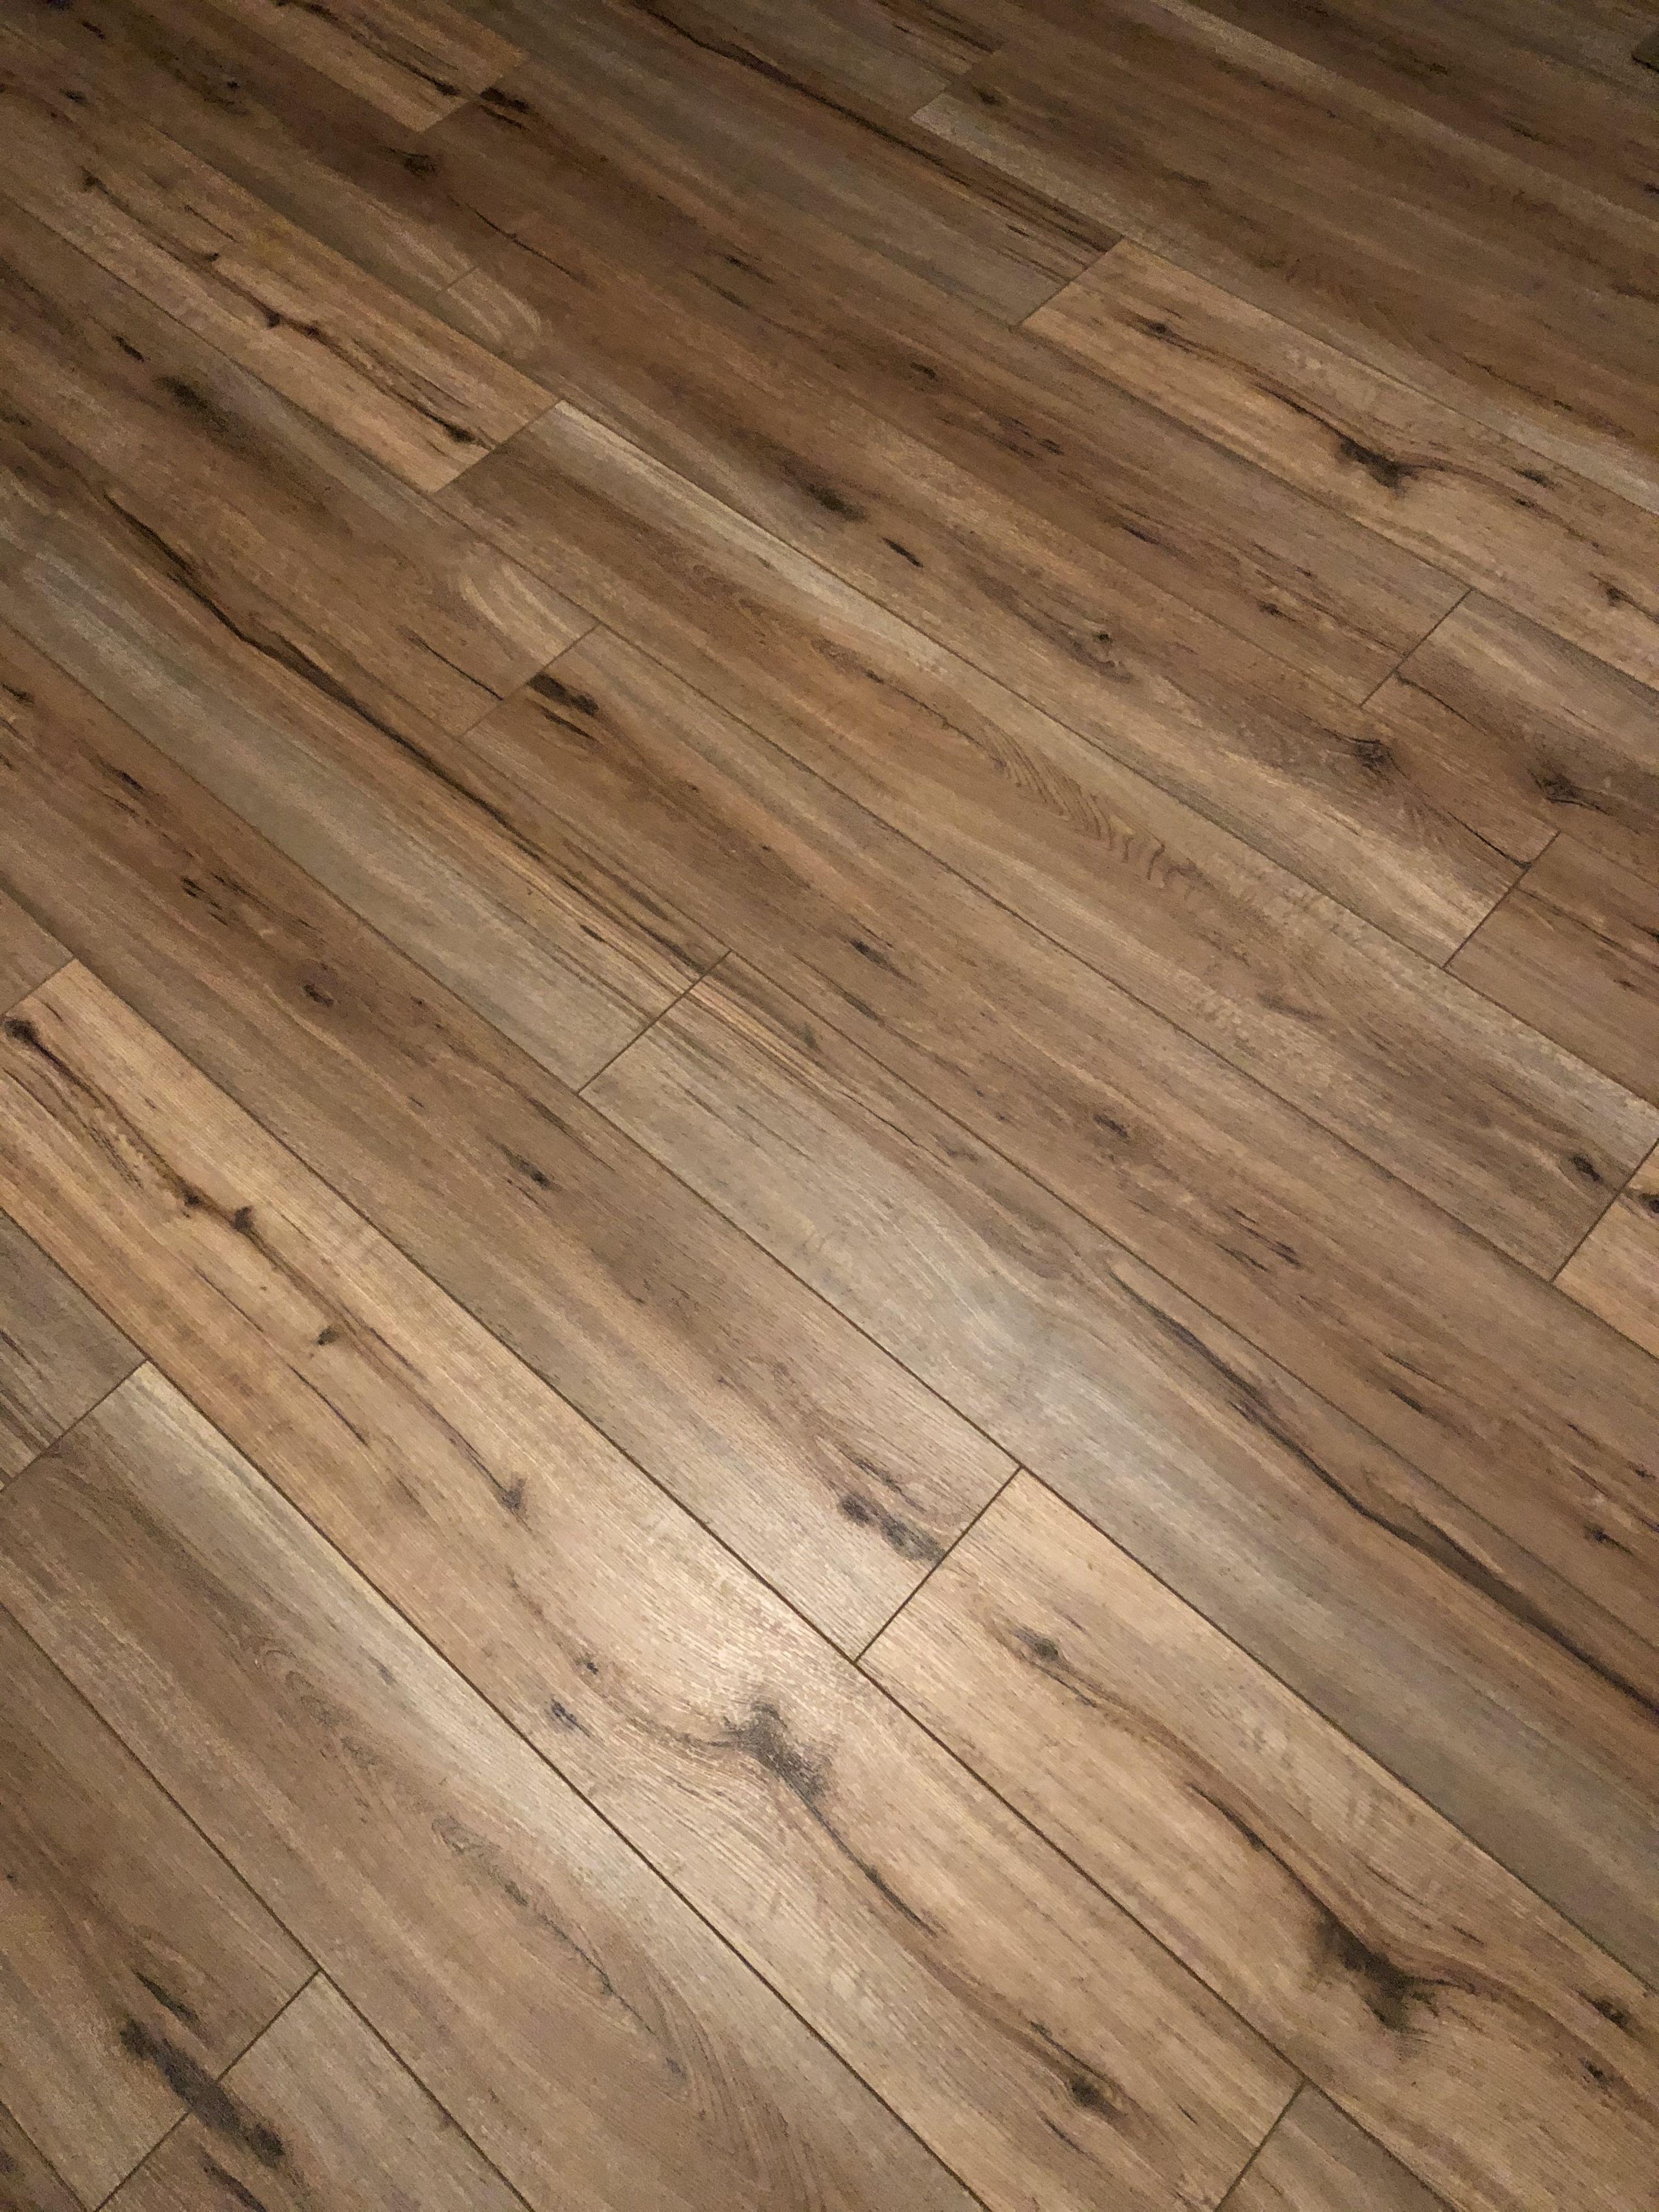 Smartcore Pro Burbank Oak Wide Thick Waterproof Interlocking Luxury 16 54 Sq Ft Lowes Com Vinyl Plank Flooring Vinyl Plank Plank Flooring